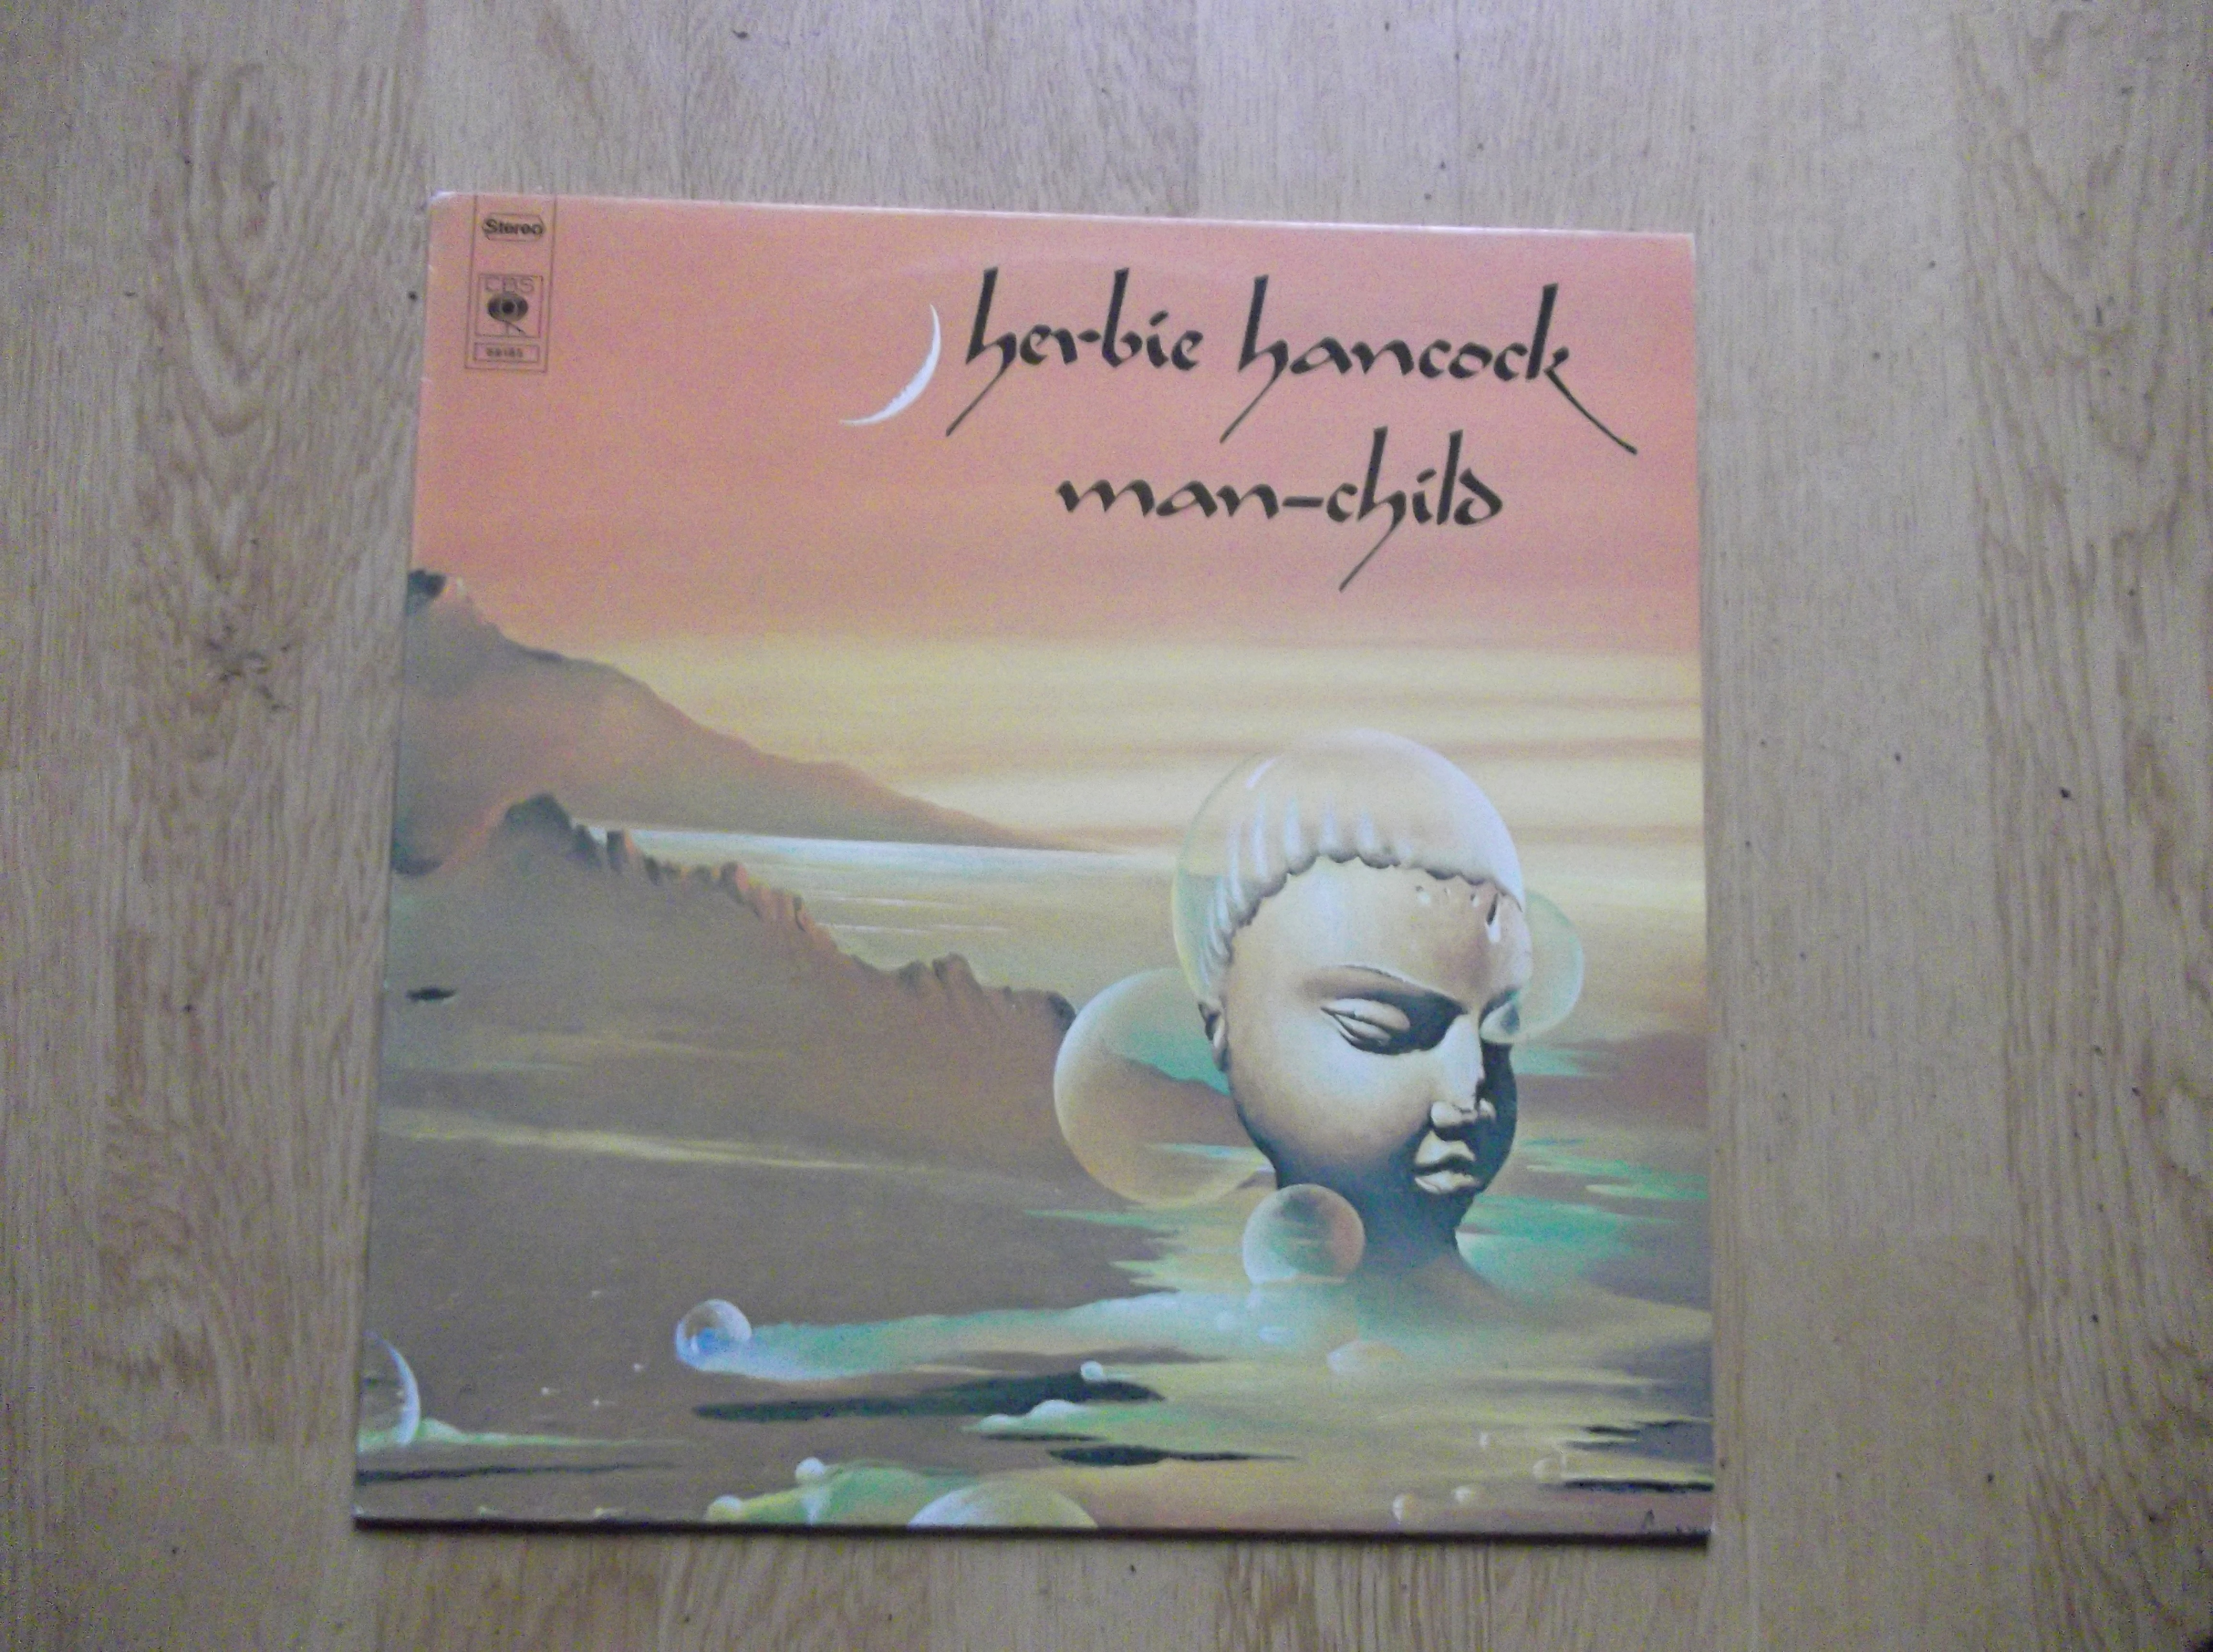 HERBIE HANCOCK - Man-Child - LP